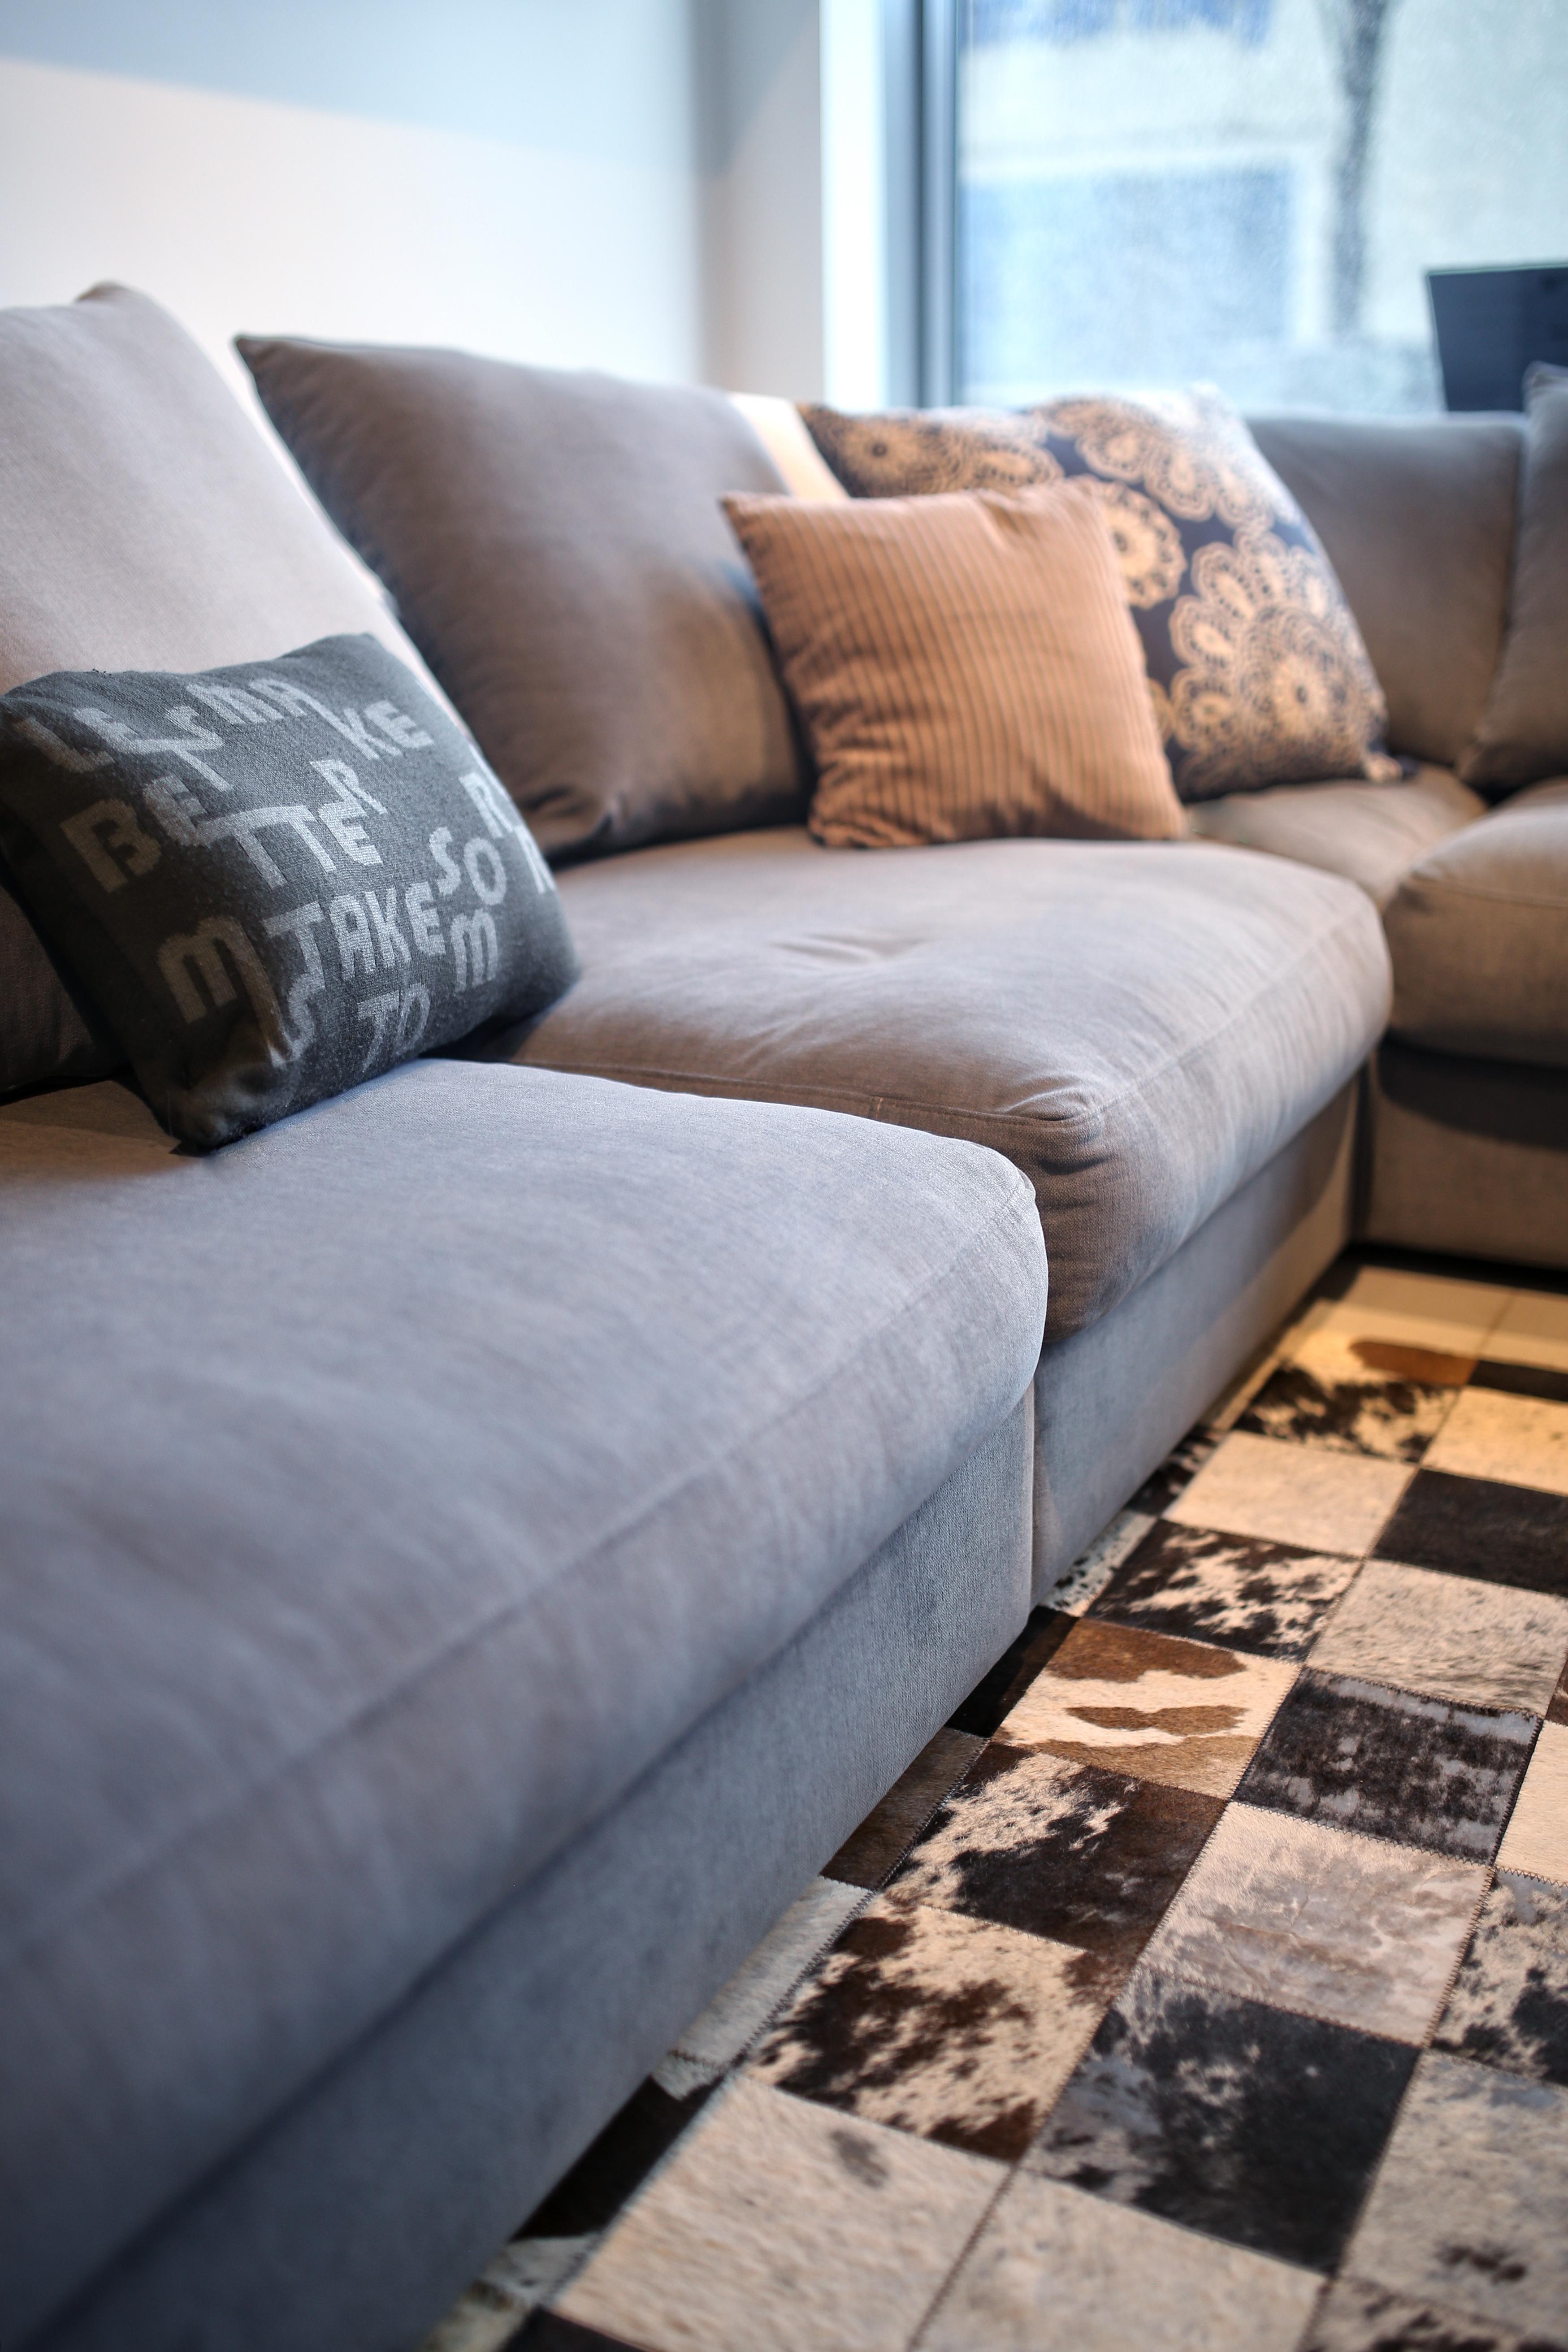 Fotos gratis : madera, piso, interior, casa, sala, mueble ...